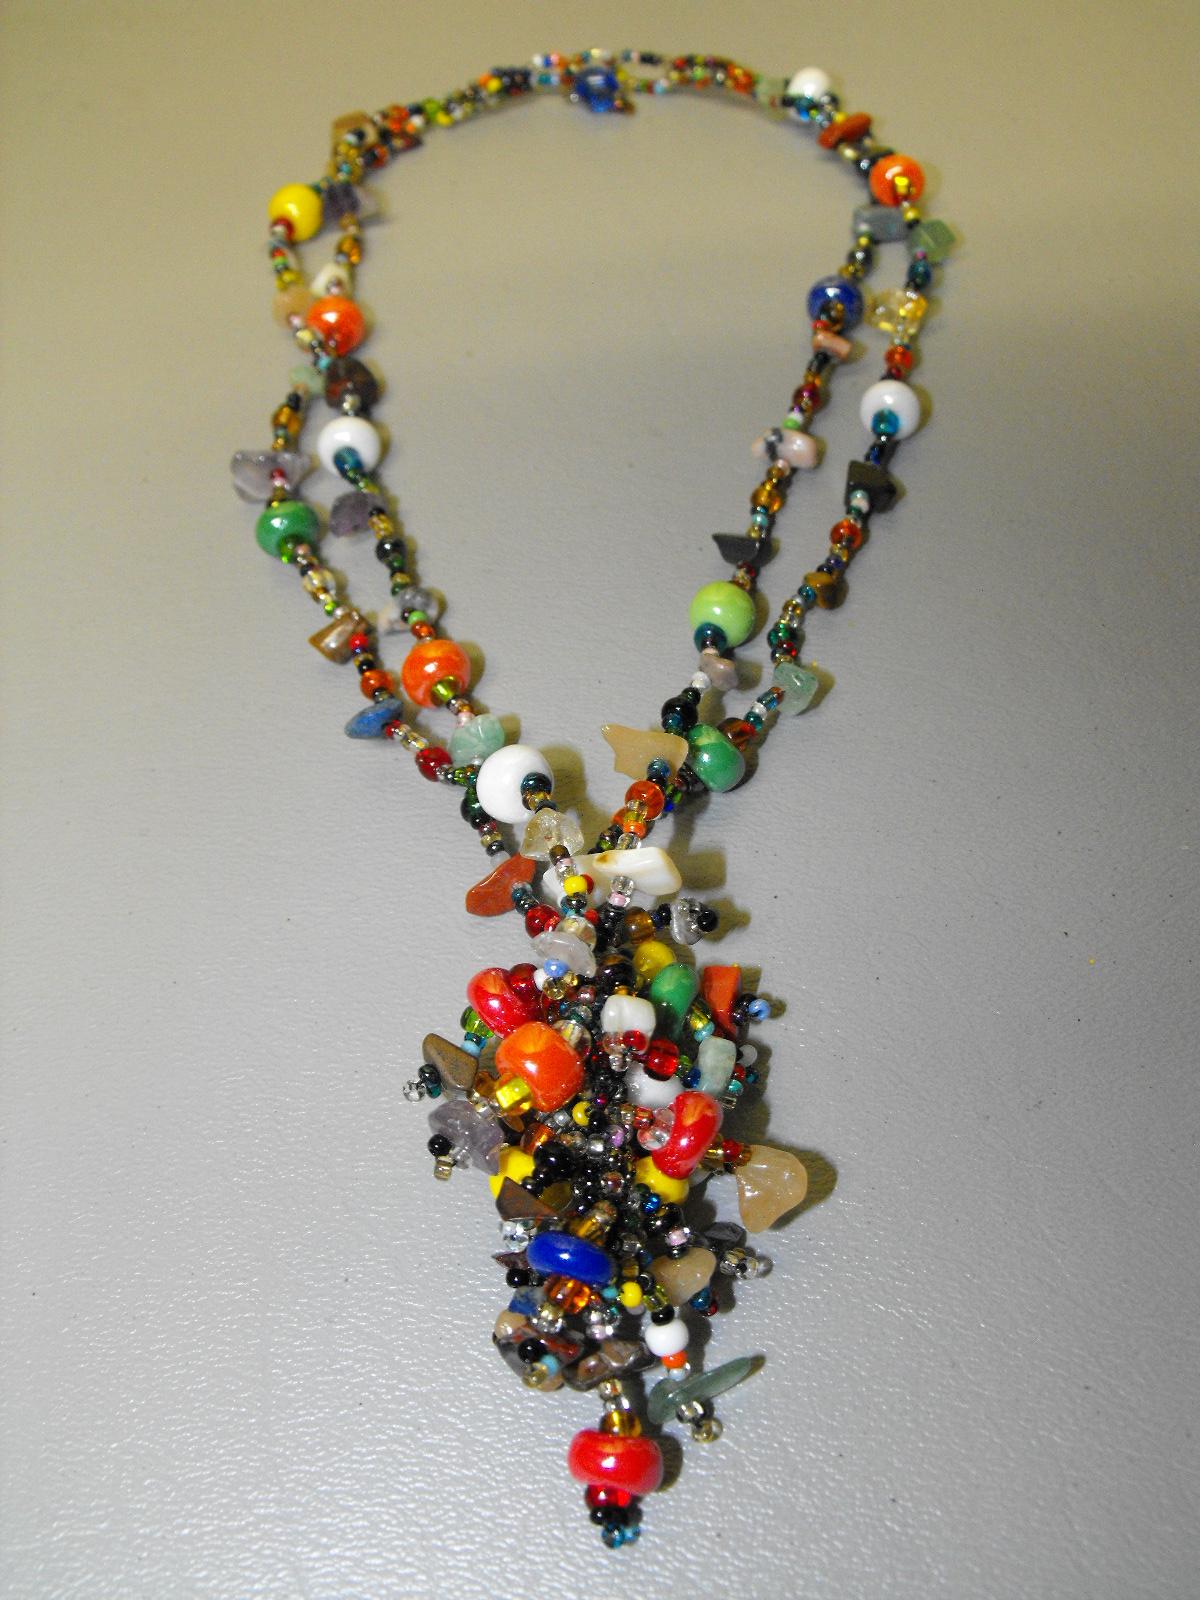 Guatemalan Artisan Crafted Glass Amp Bead Necklace 3